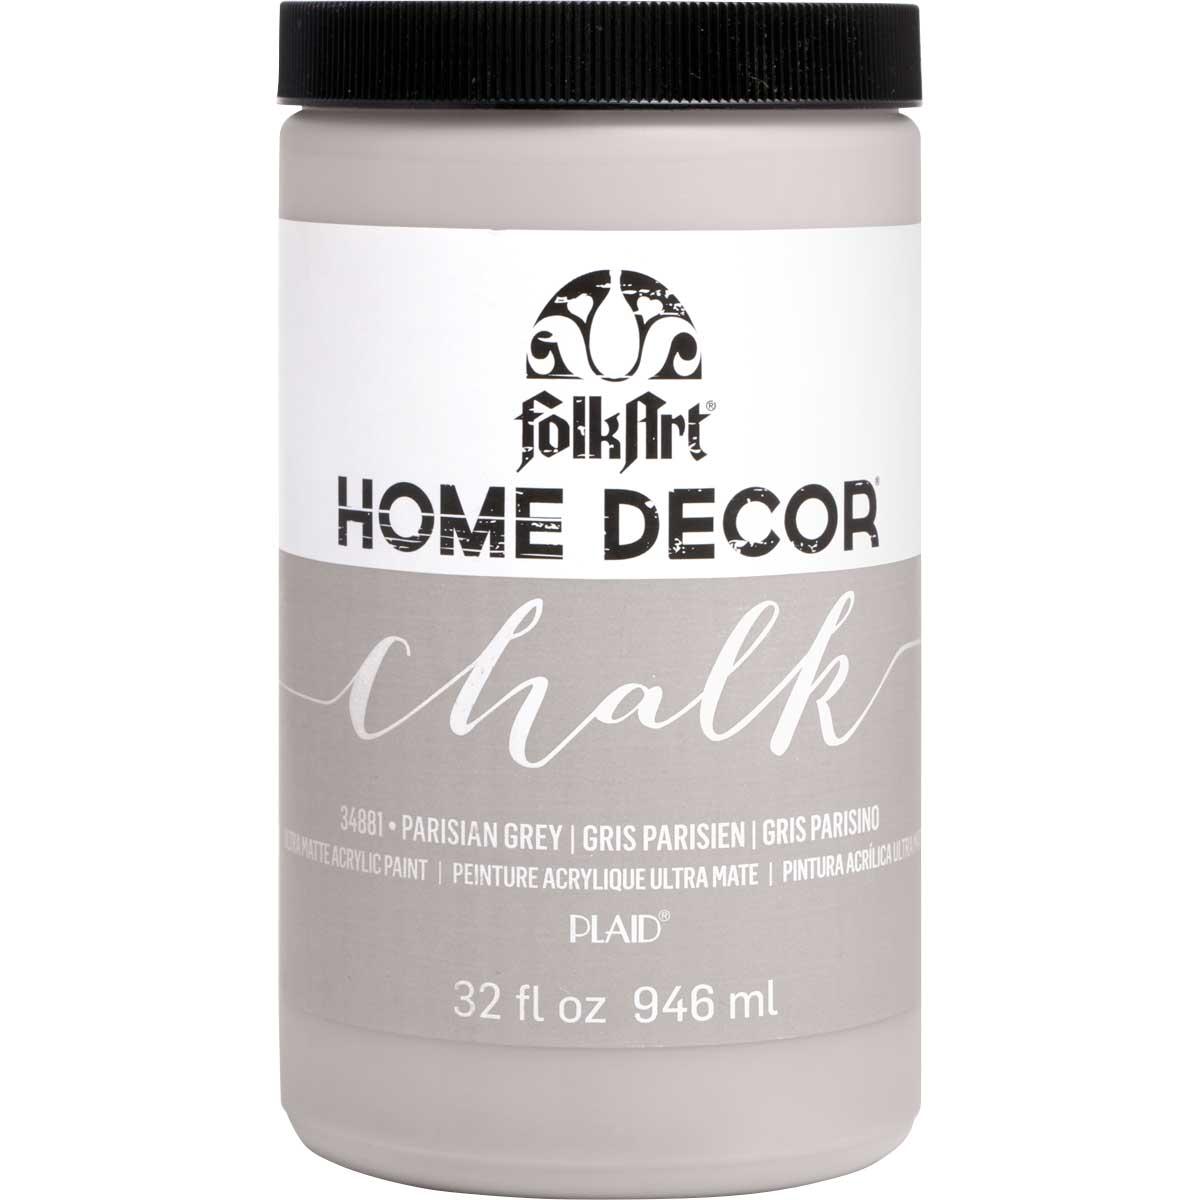 FolkArt ® Home Decor™ Chalk - Parisian Grey, 32 oz.